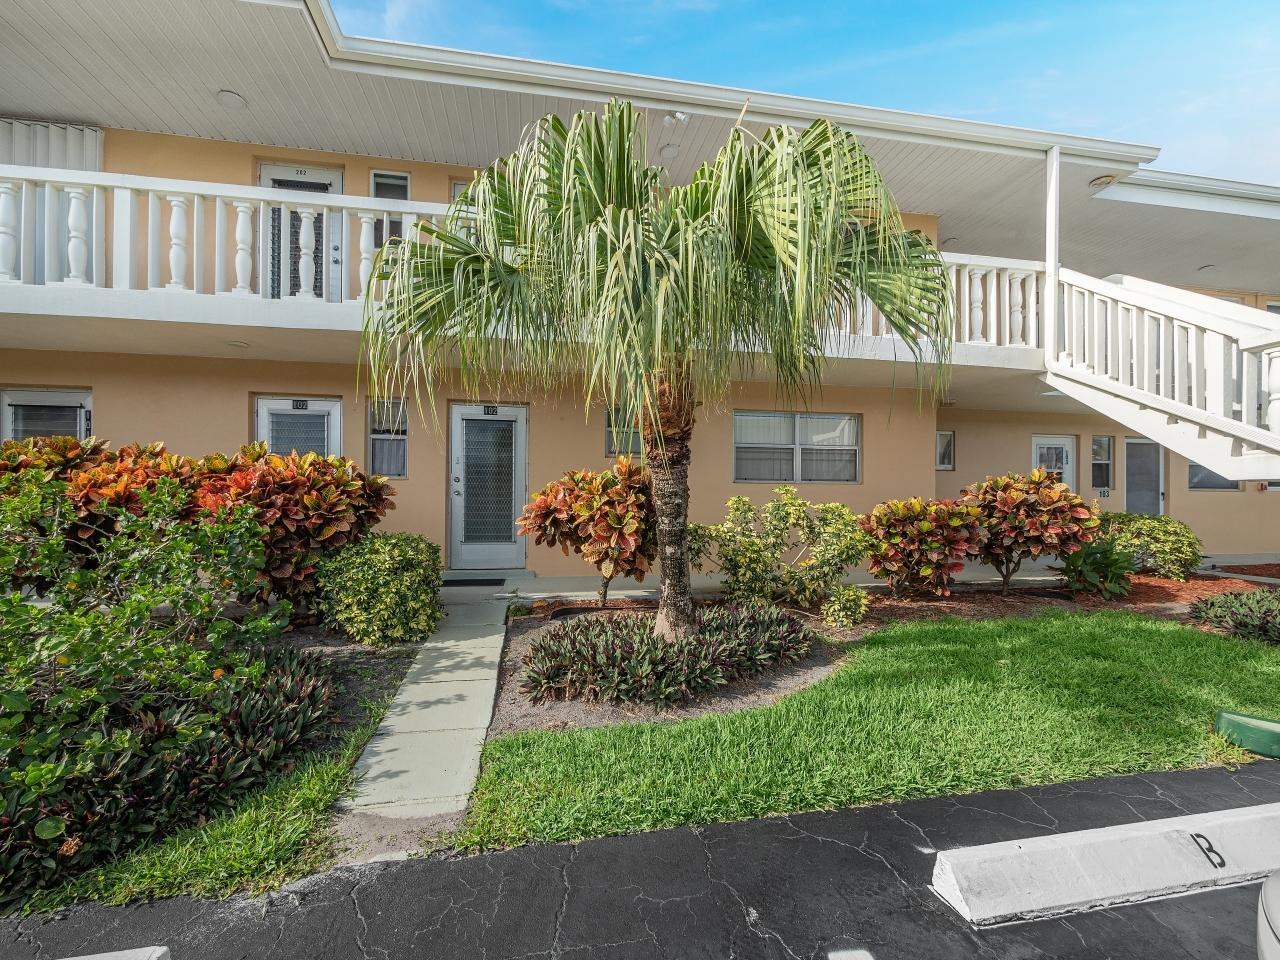 2121 NE 1st Court 202 Boynton Beach, FL 33435